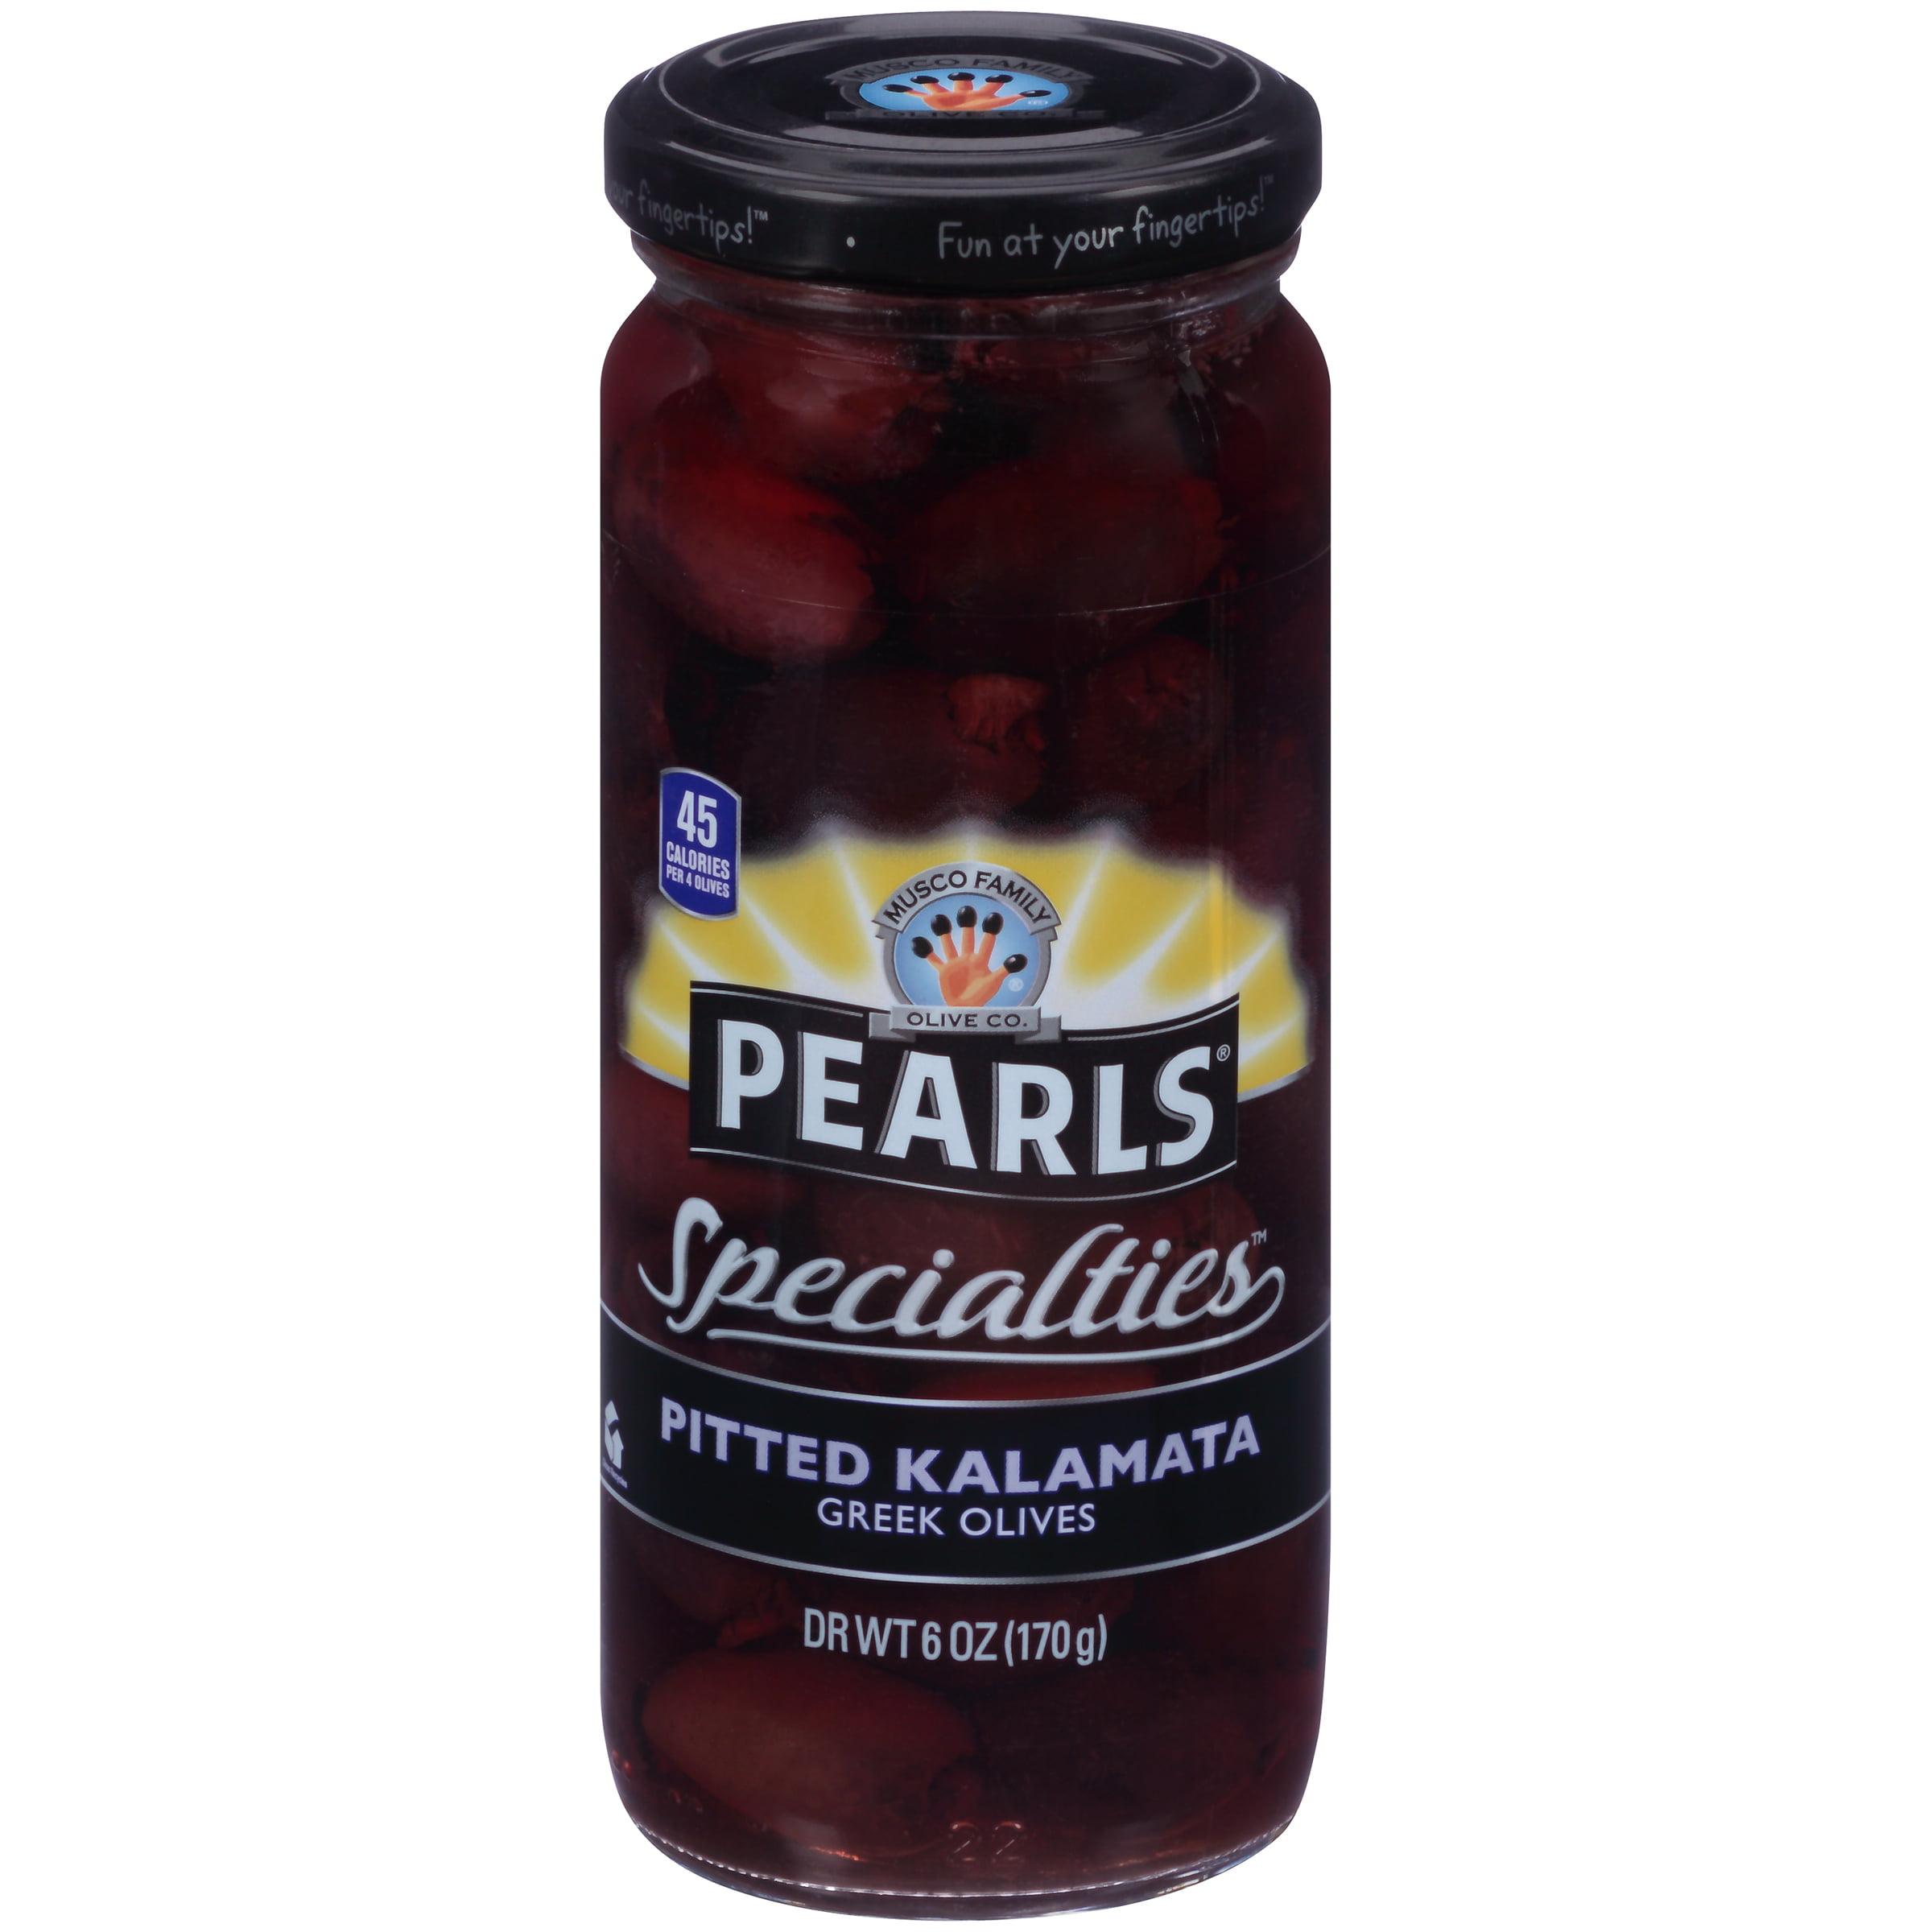 (2 Pack) Pearls? Specialties? Pitted Kalamata Greek Olives 6 oz. Jar